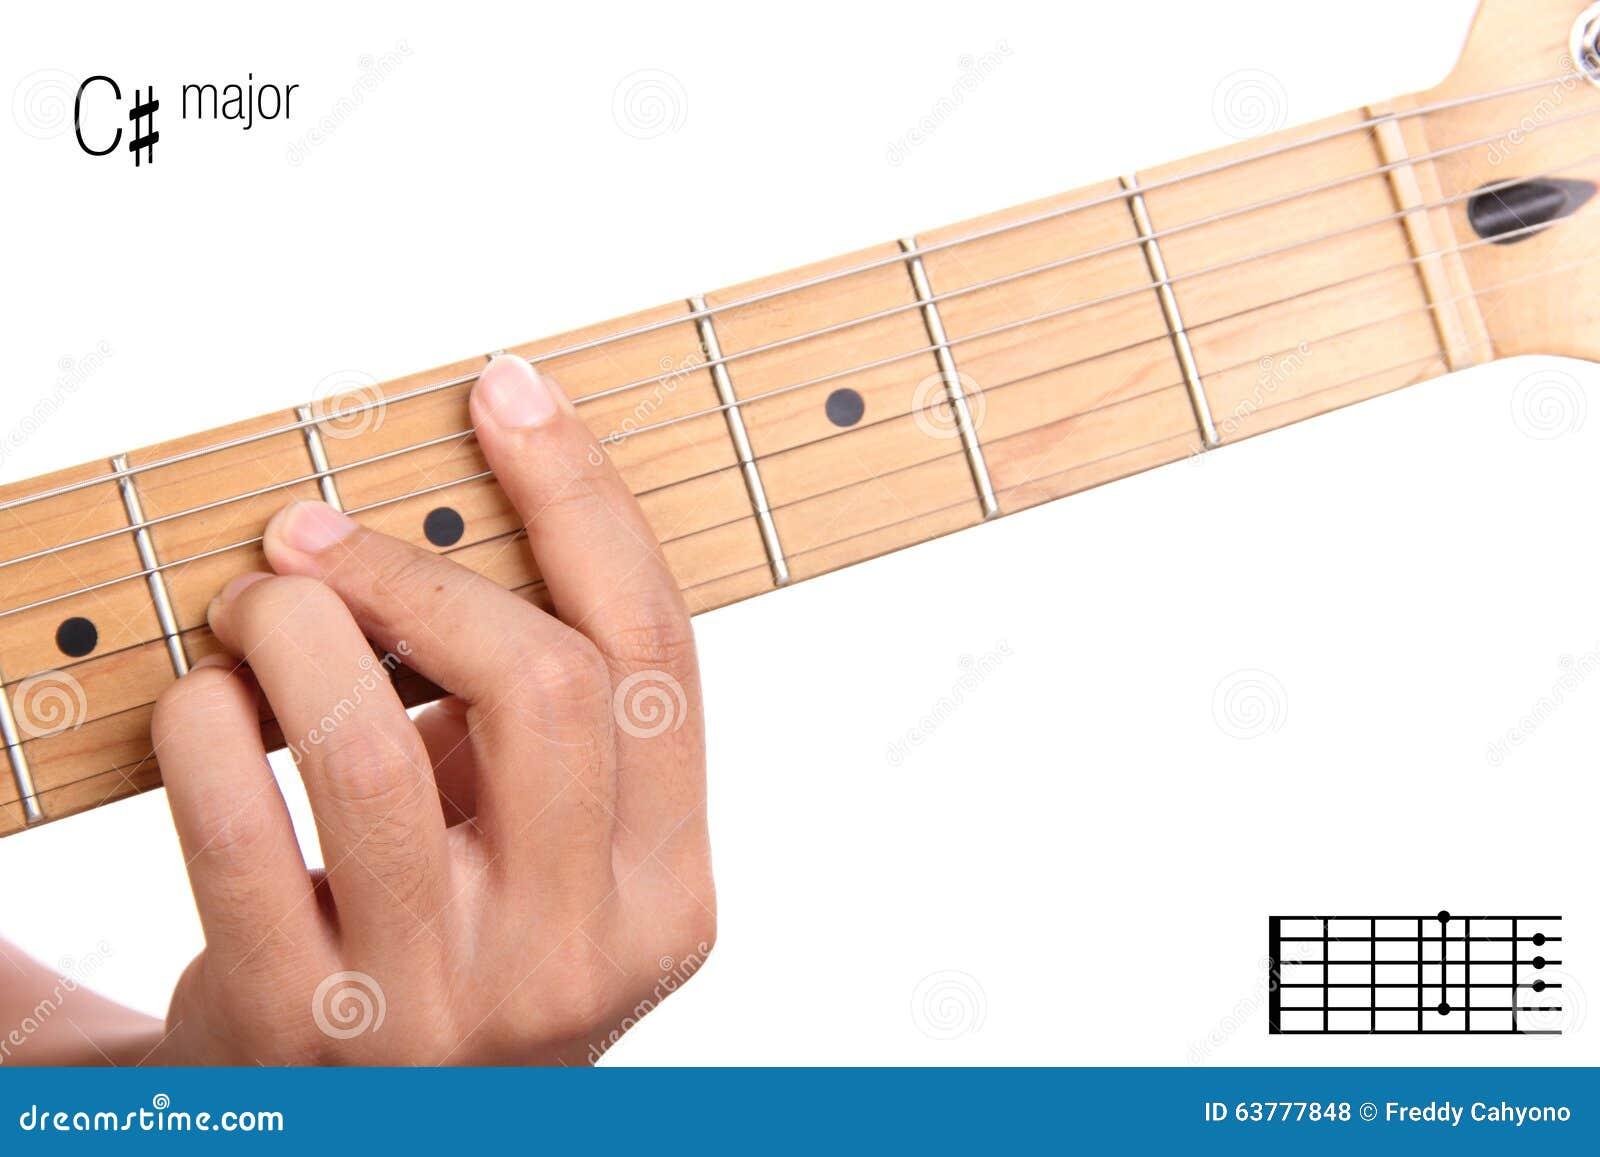 C Sharp Major Guitar Chord Tutorial Stock Photo Image Of